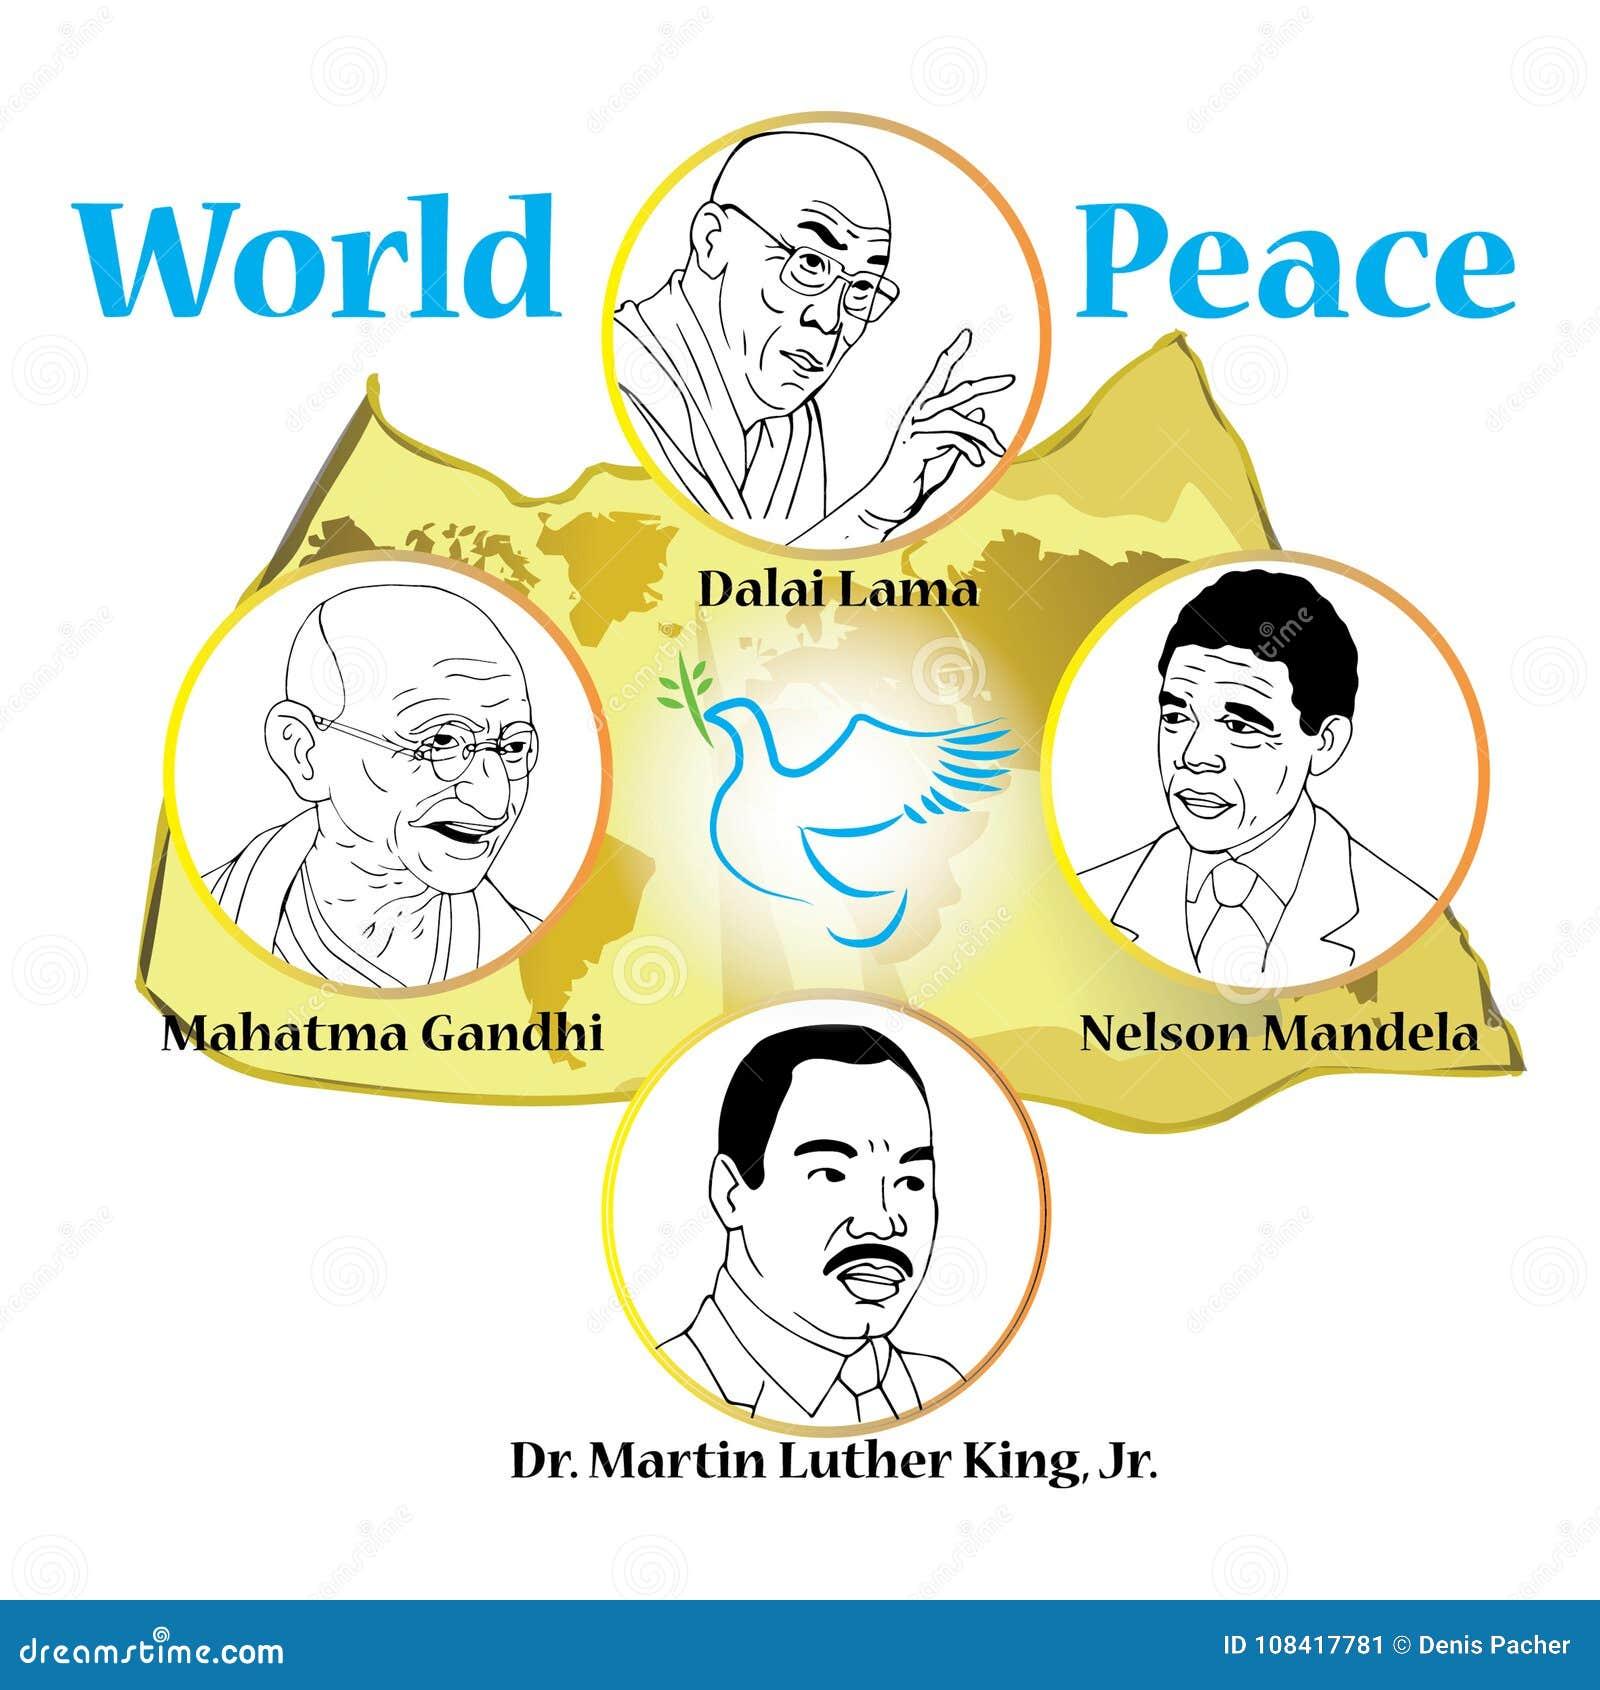 Mahatam Gandhi, Dalai Lama, Nelson Mandela, Martin Luther King